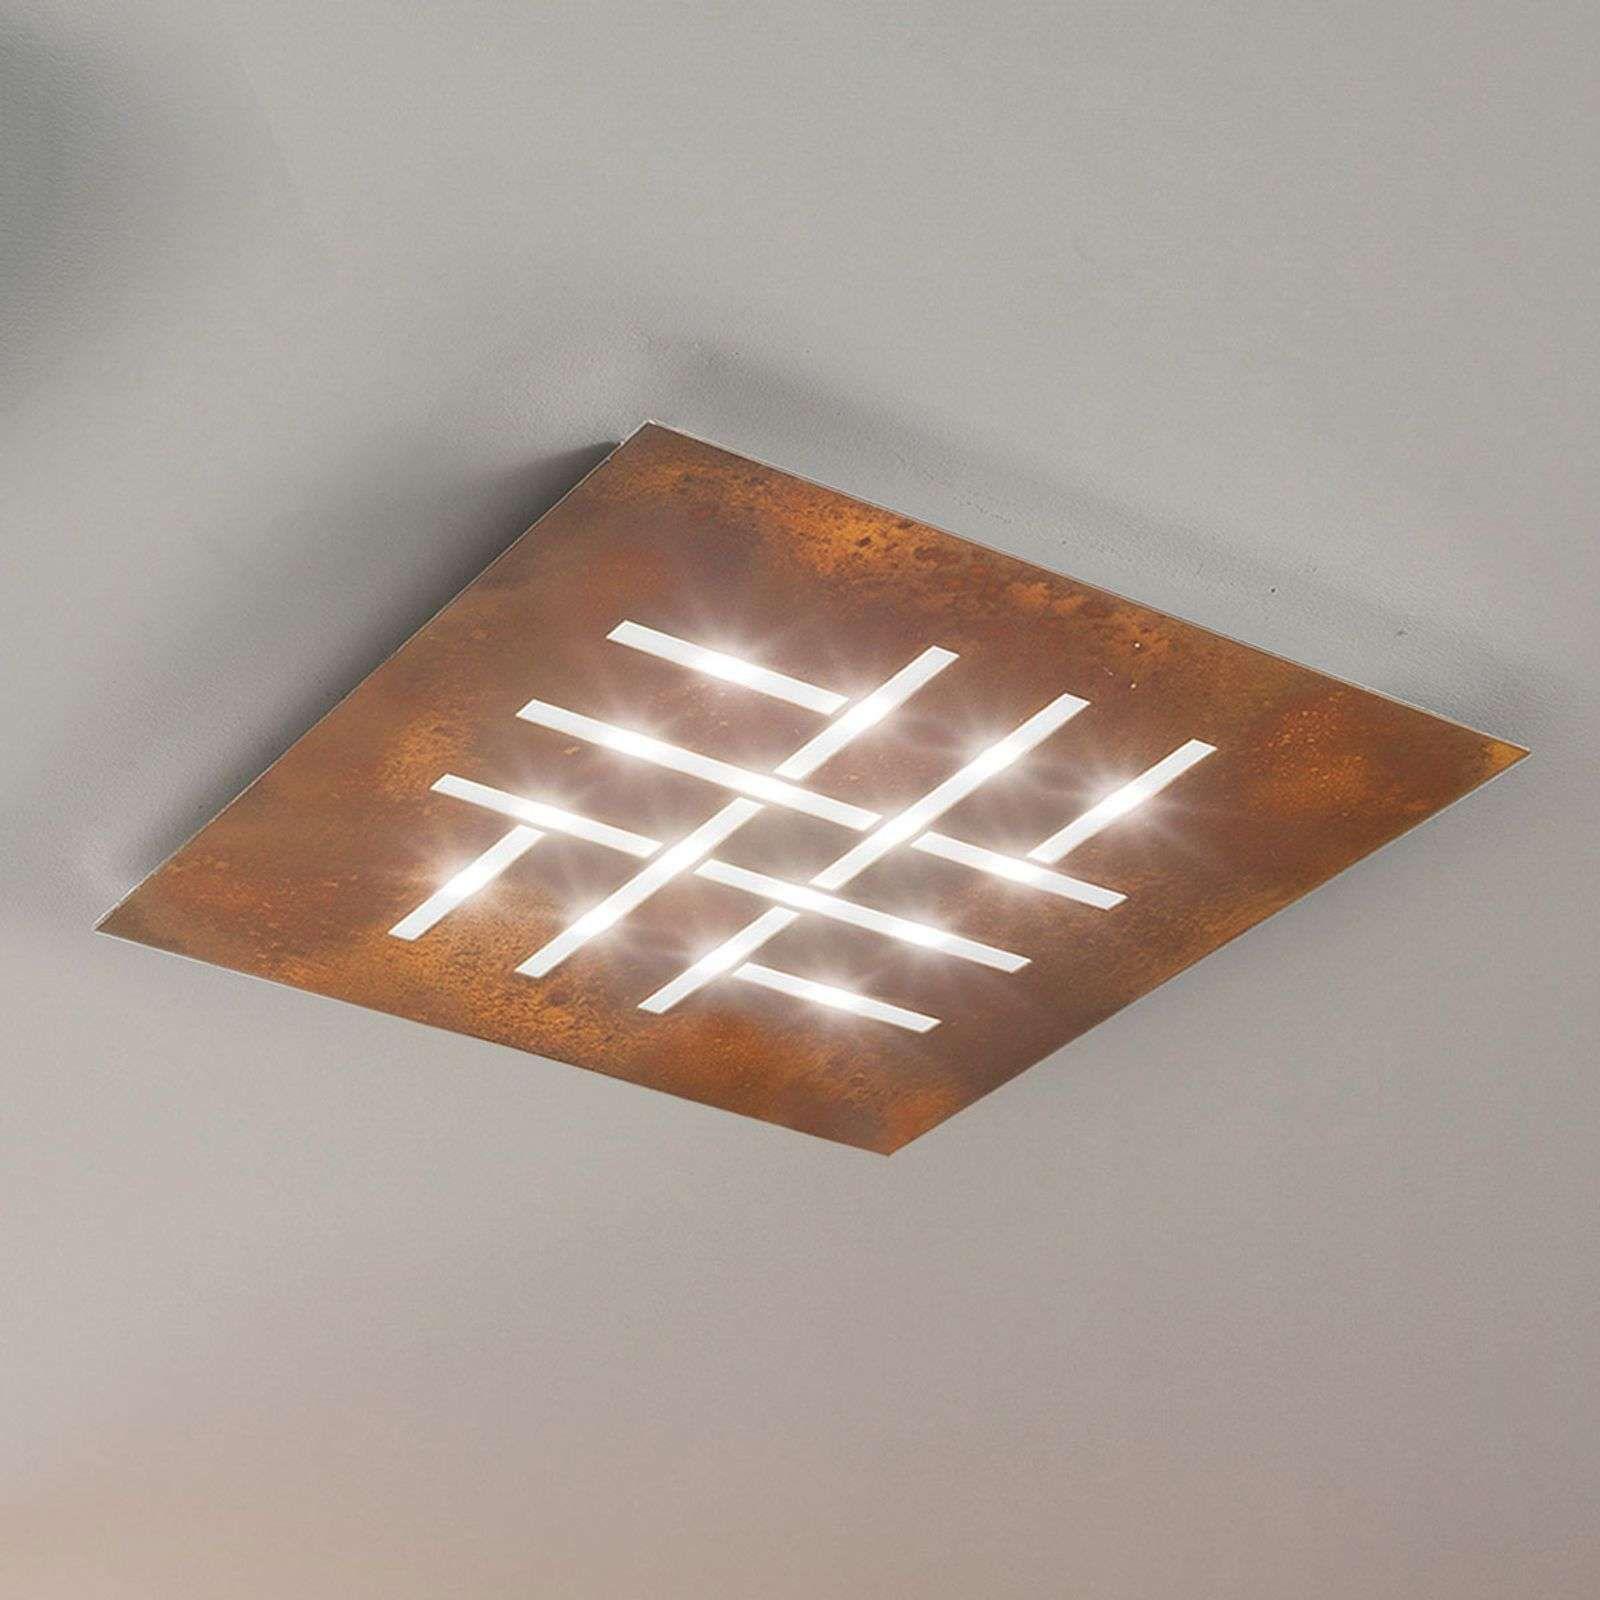 Lampen Plafond Gamma Plafondverlichting Led Badkamer Plafondlamp Badkamer Design Spot Plafondlamp Led Pla Plafondlamp Plafondverlichting Lampen Plafond